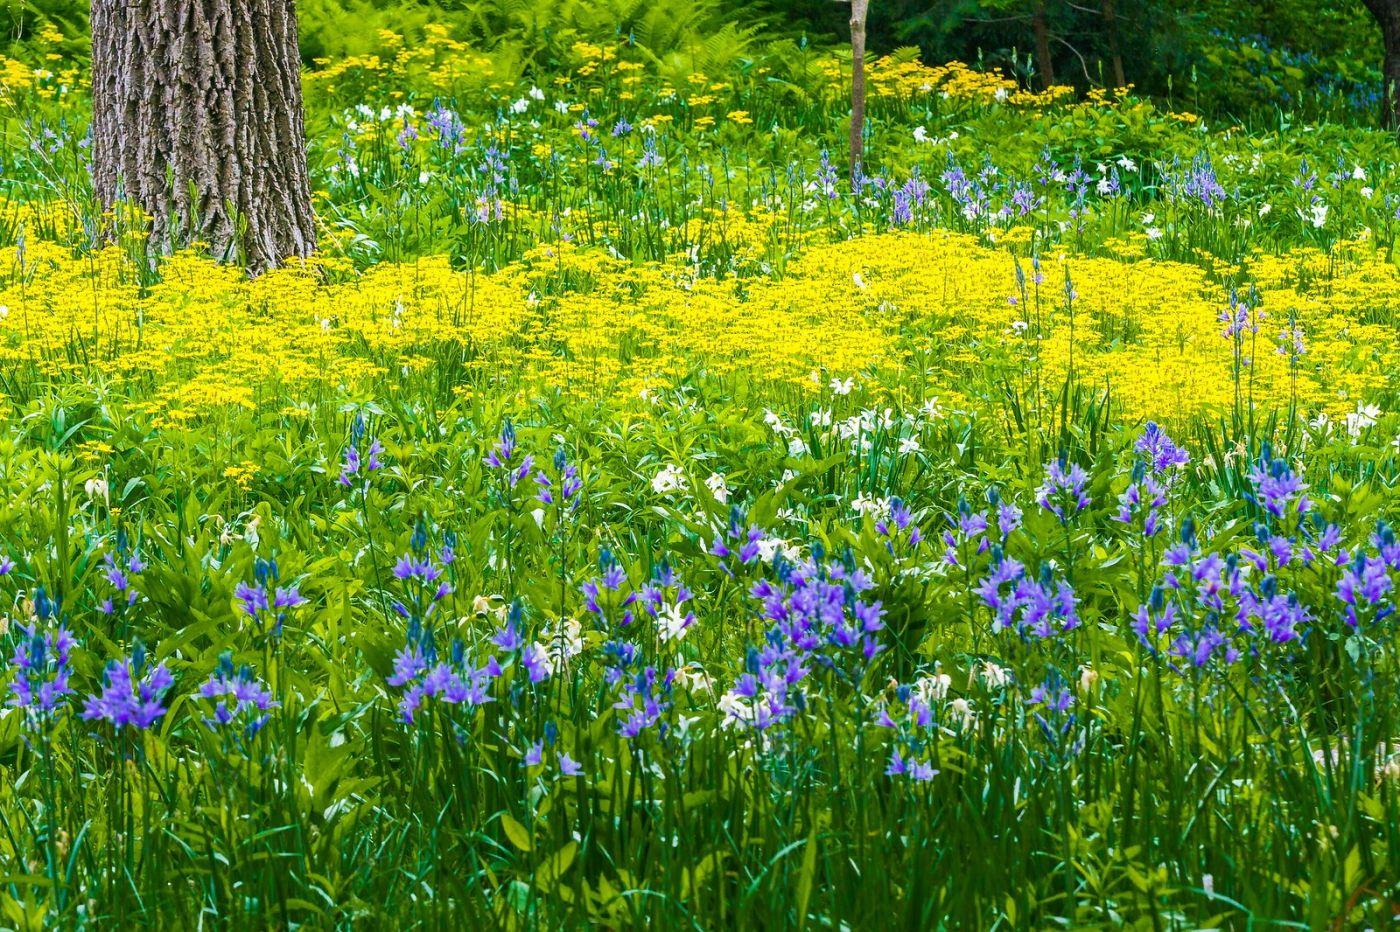 Chanticleer花园,有梦想的季节_图1-12